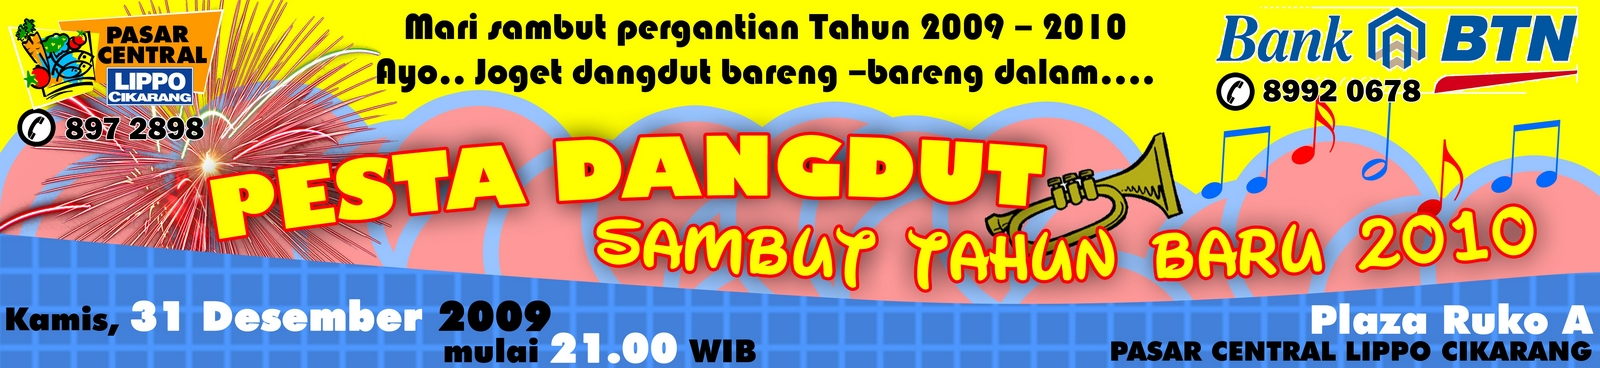 Gambar Asha Creative Design Twitter Contoh Desain Banner Imlek Https